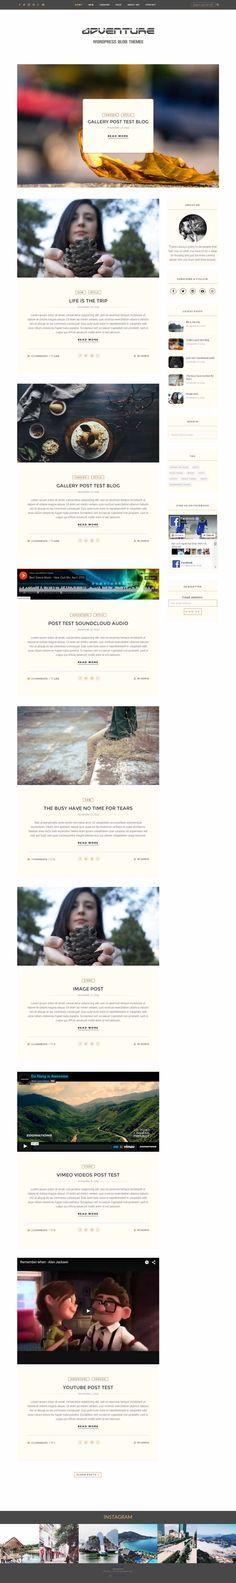 Adventure - Wordpress blog theme